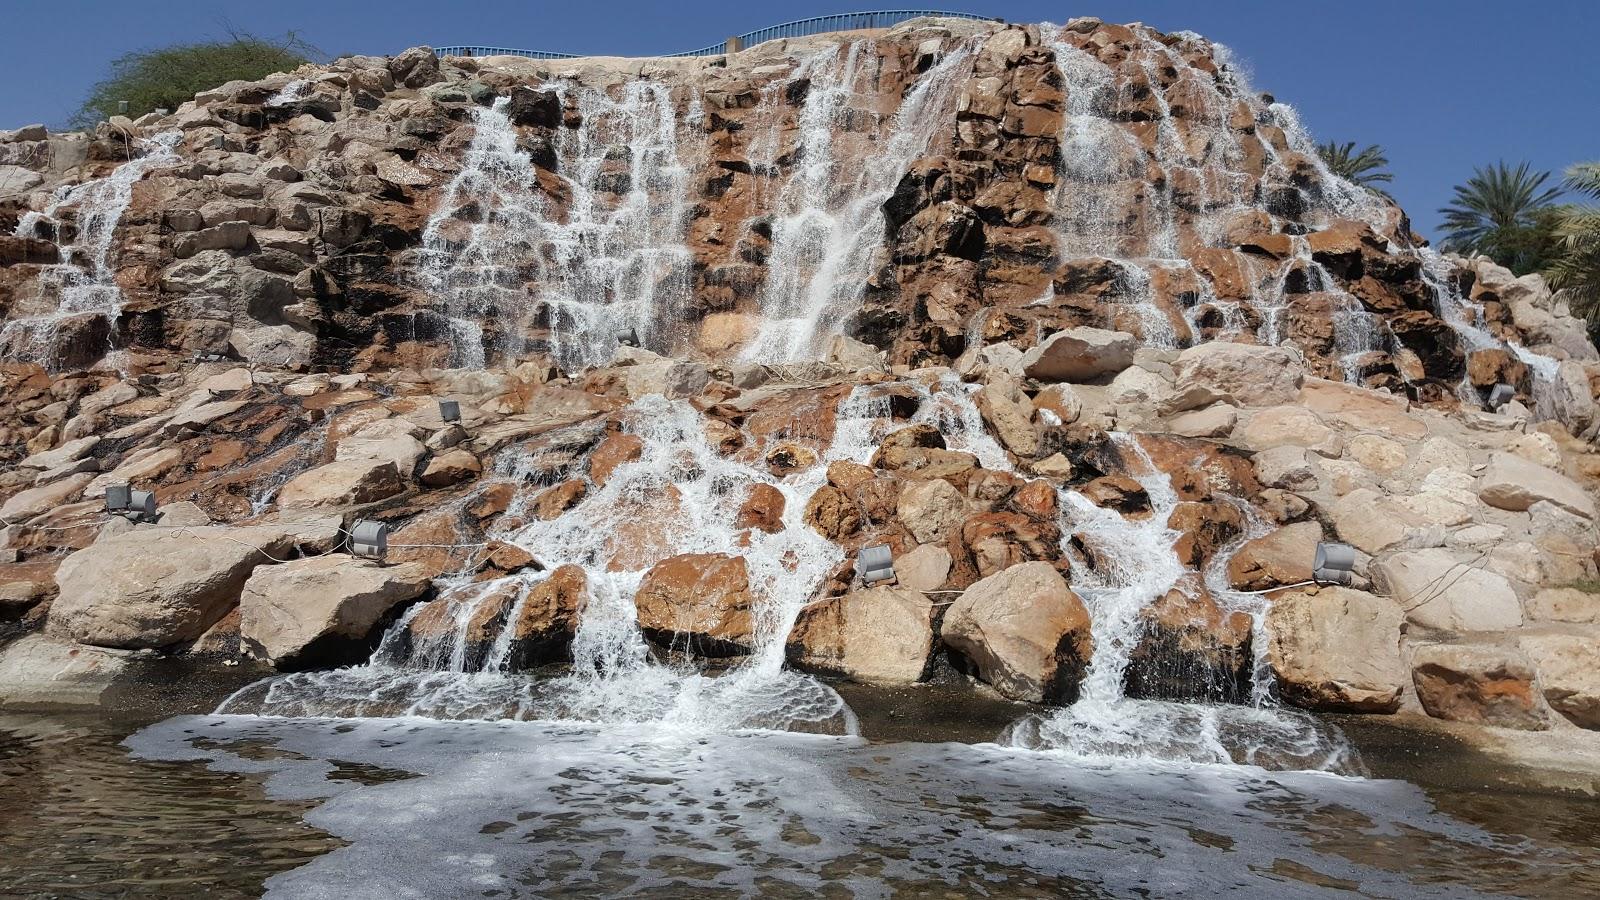 پارک طبیعی قرم مسقط عمان